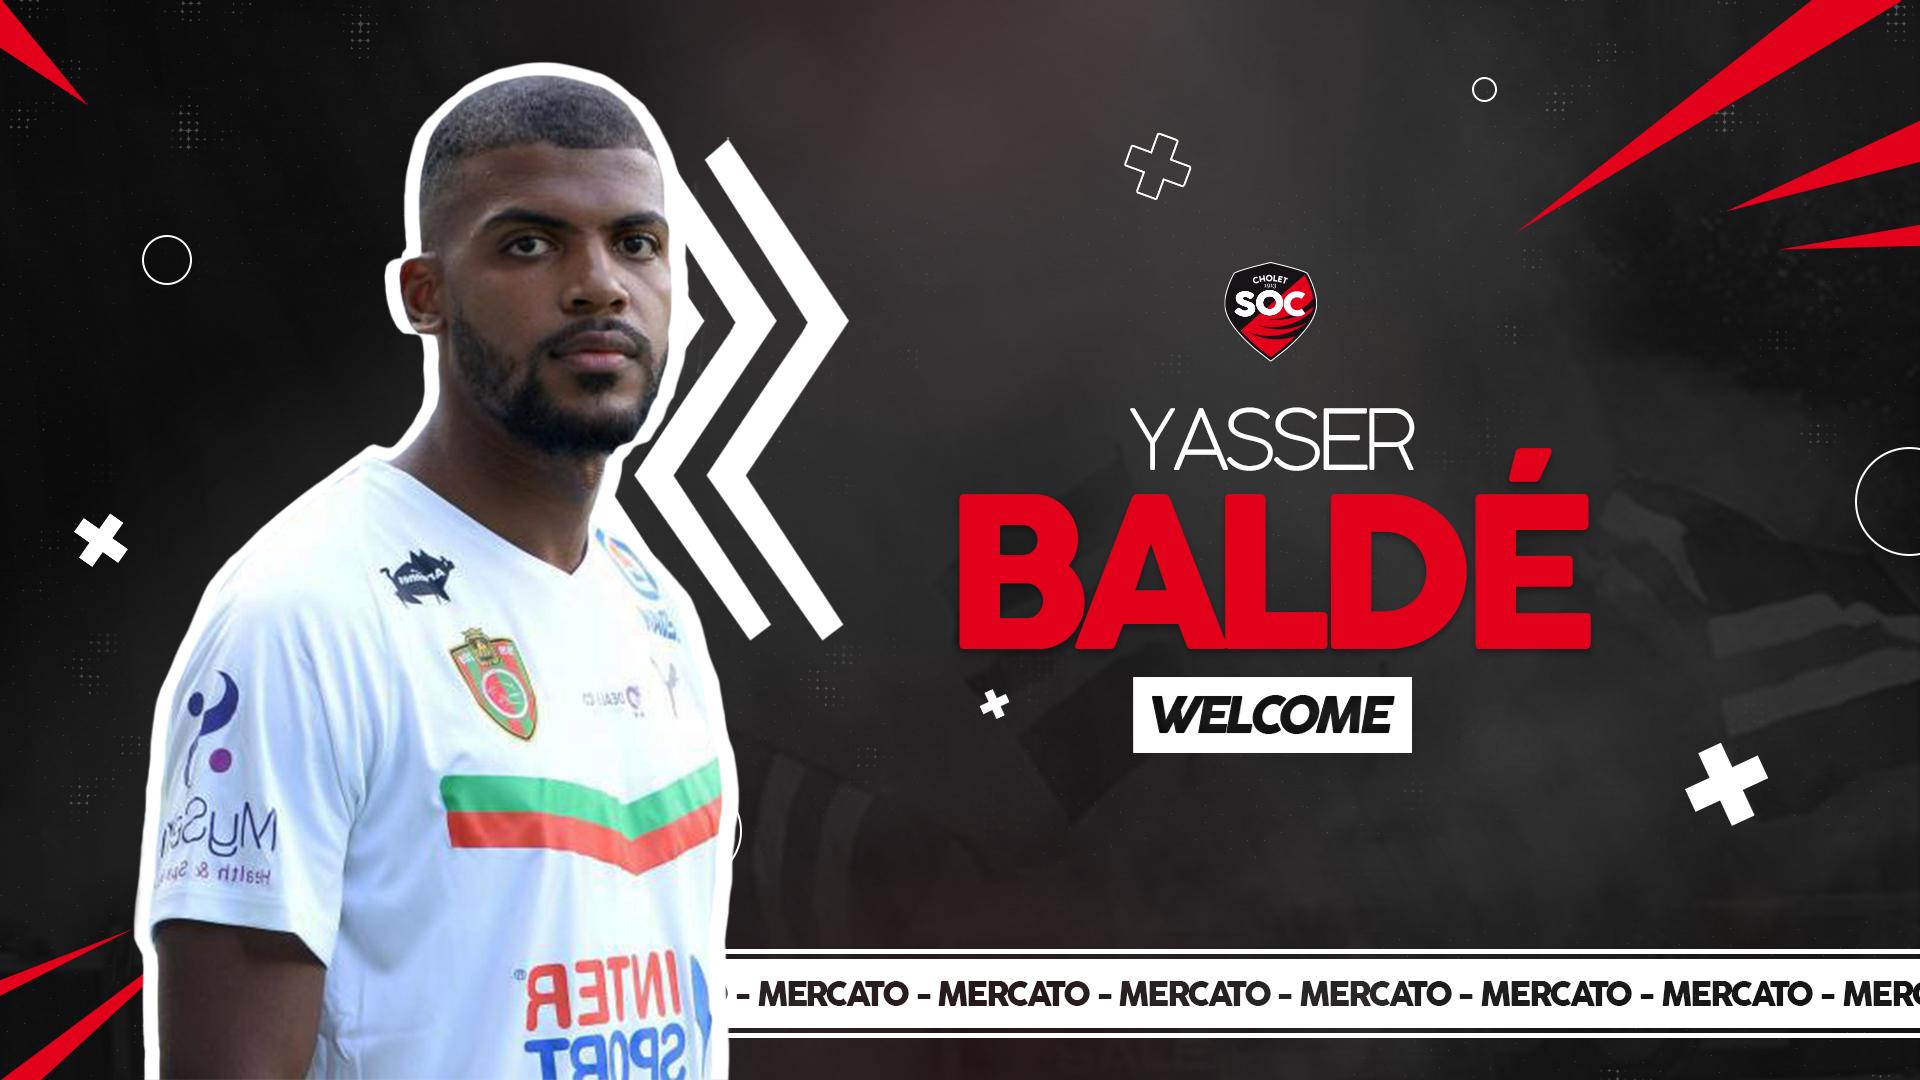 Yasser Baldxx Recrue